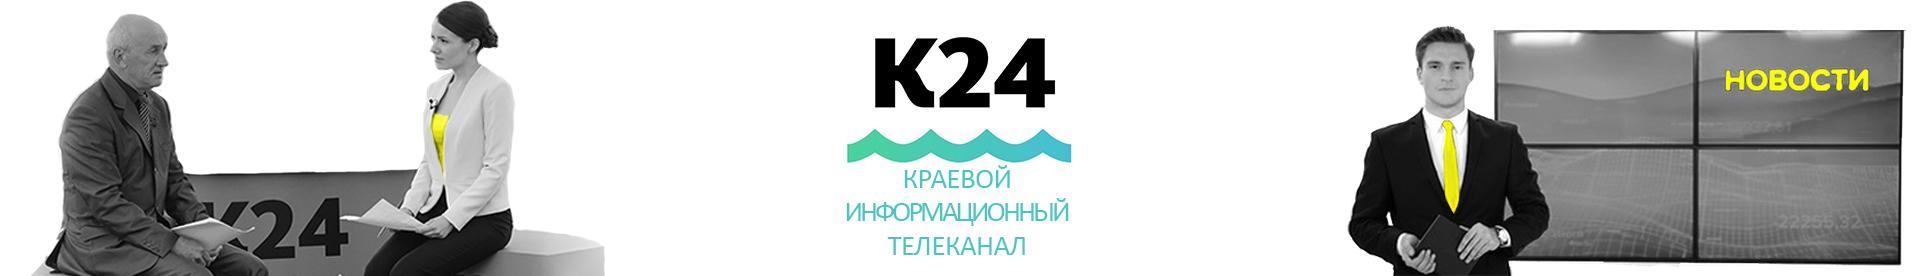 Реклама телеканал Катунь-24